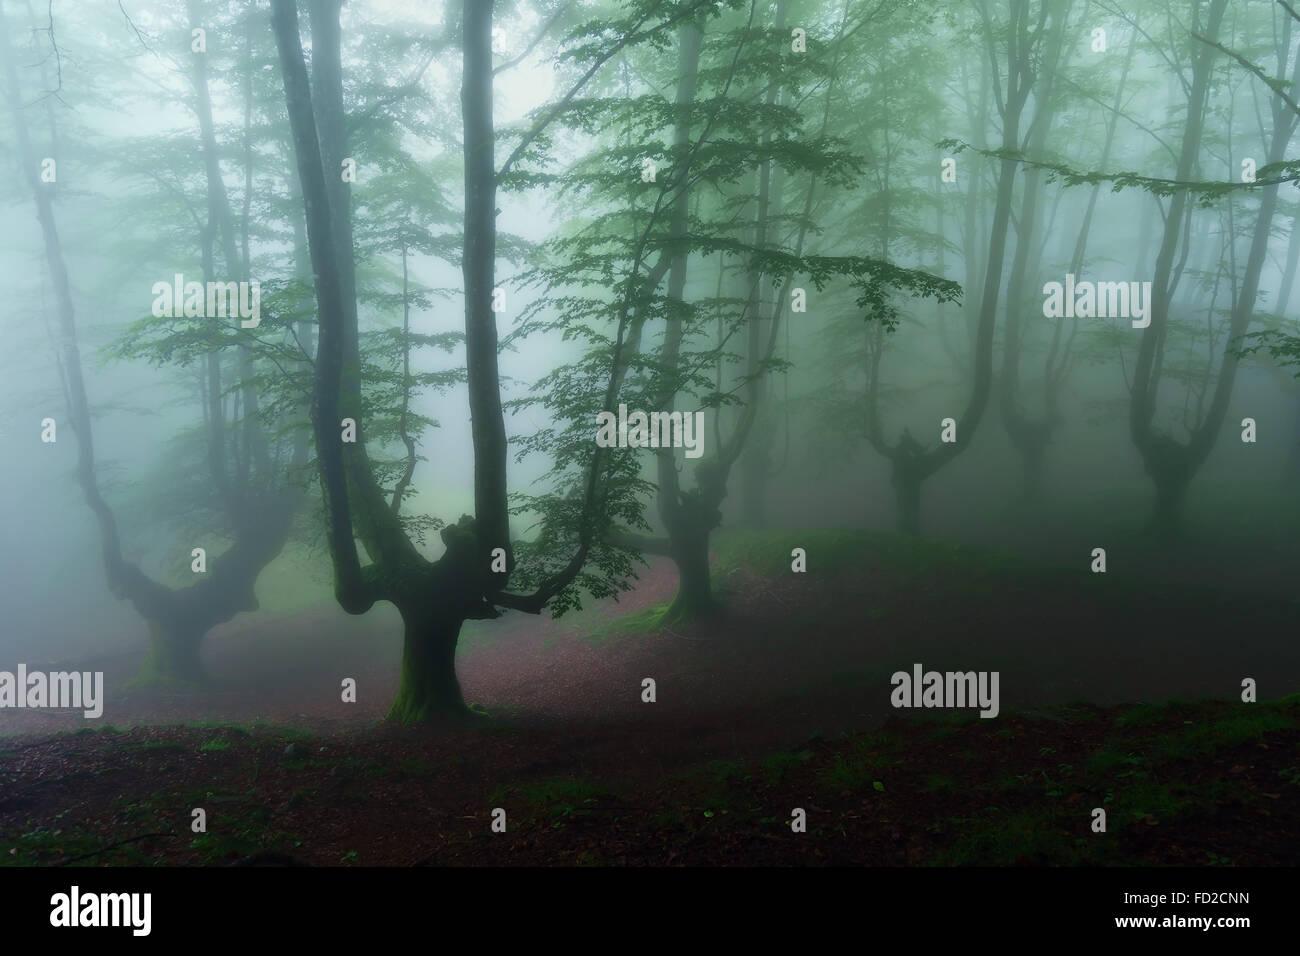 Oscuro y aterrador bosque profundo Imagen De Stock